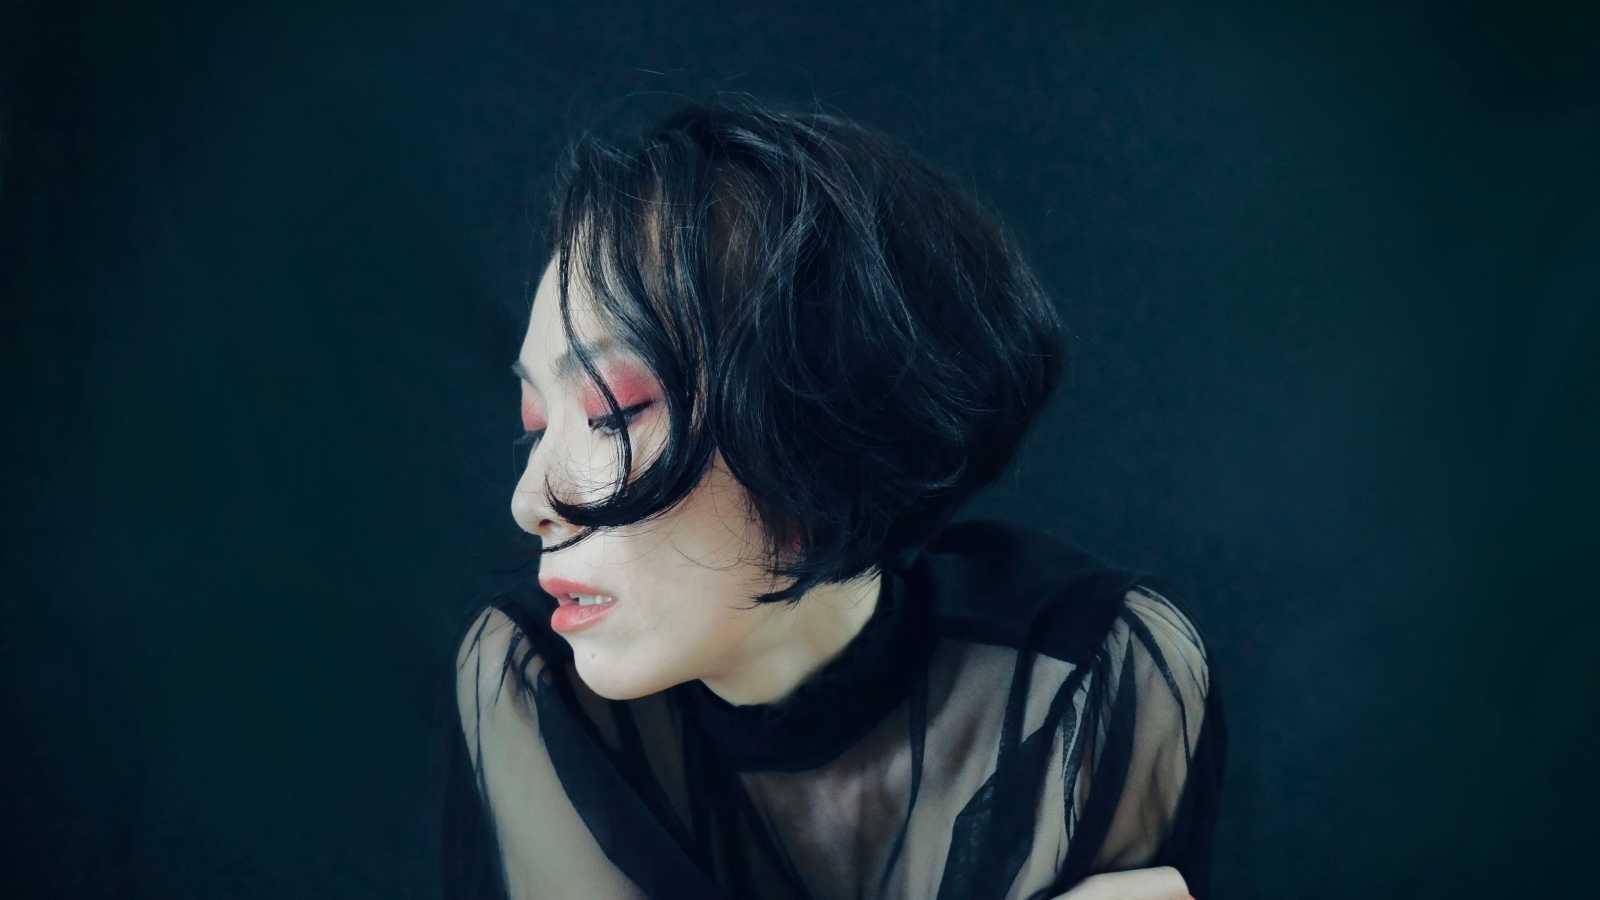 Nuevo single de SHIHORI © SHIHORI. All rights reserved.